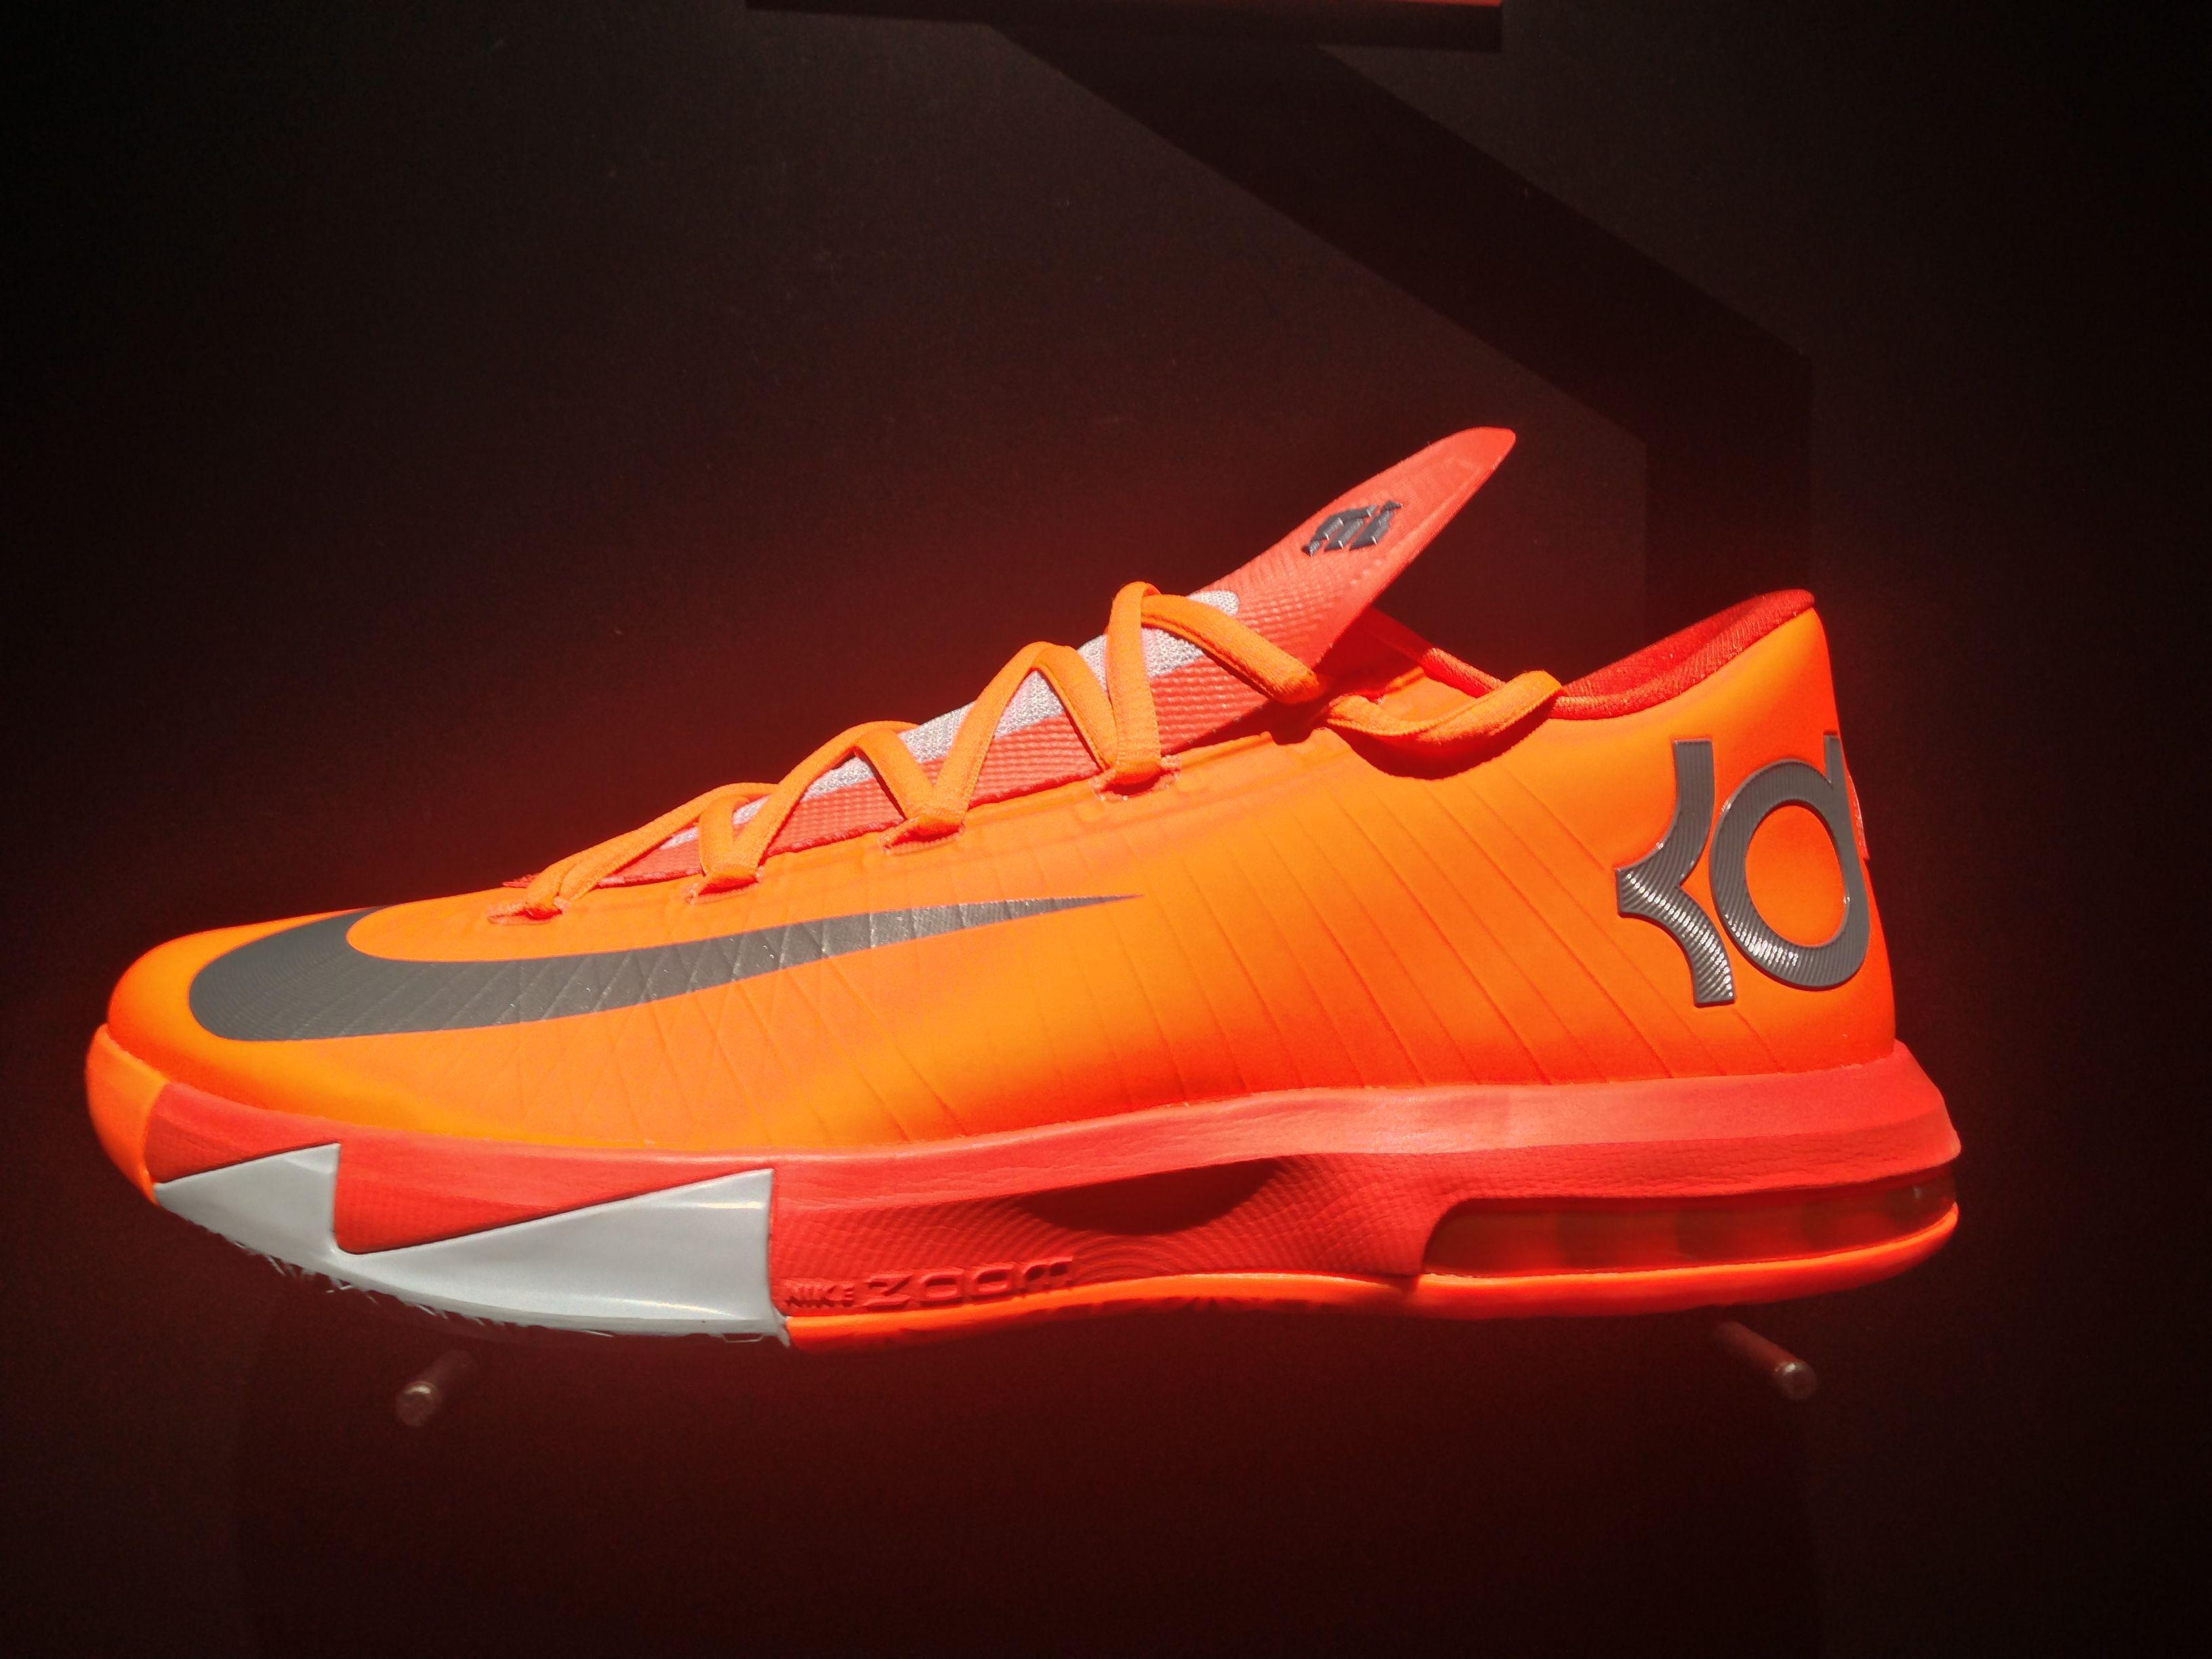 Kevin Durant Shoes | Kd shoes